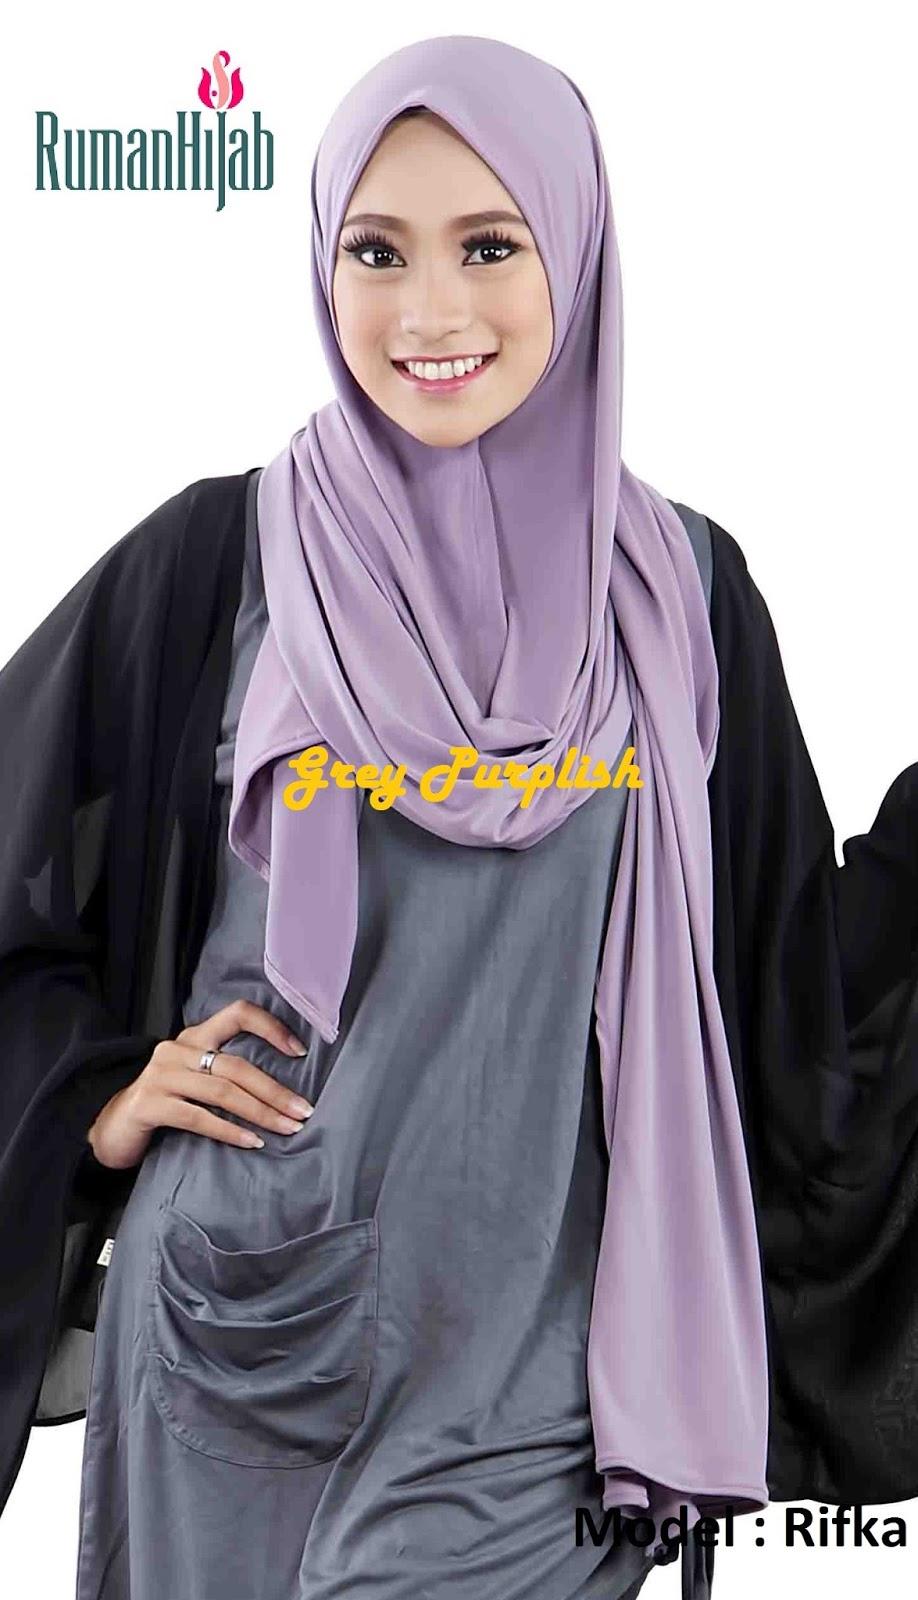 Ruman Hijab Agustus 2016